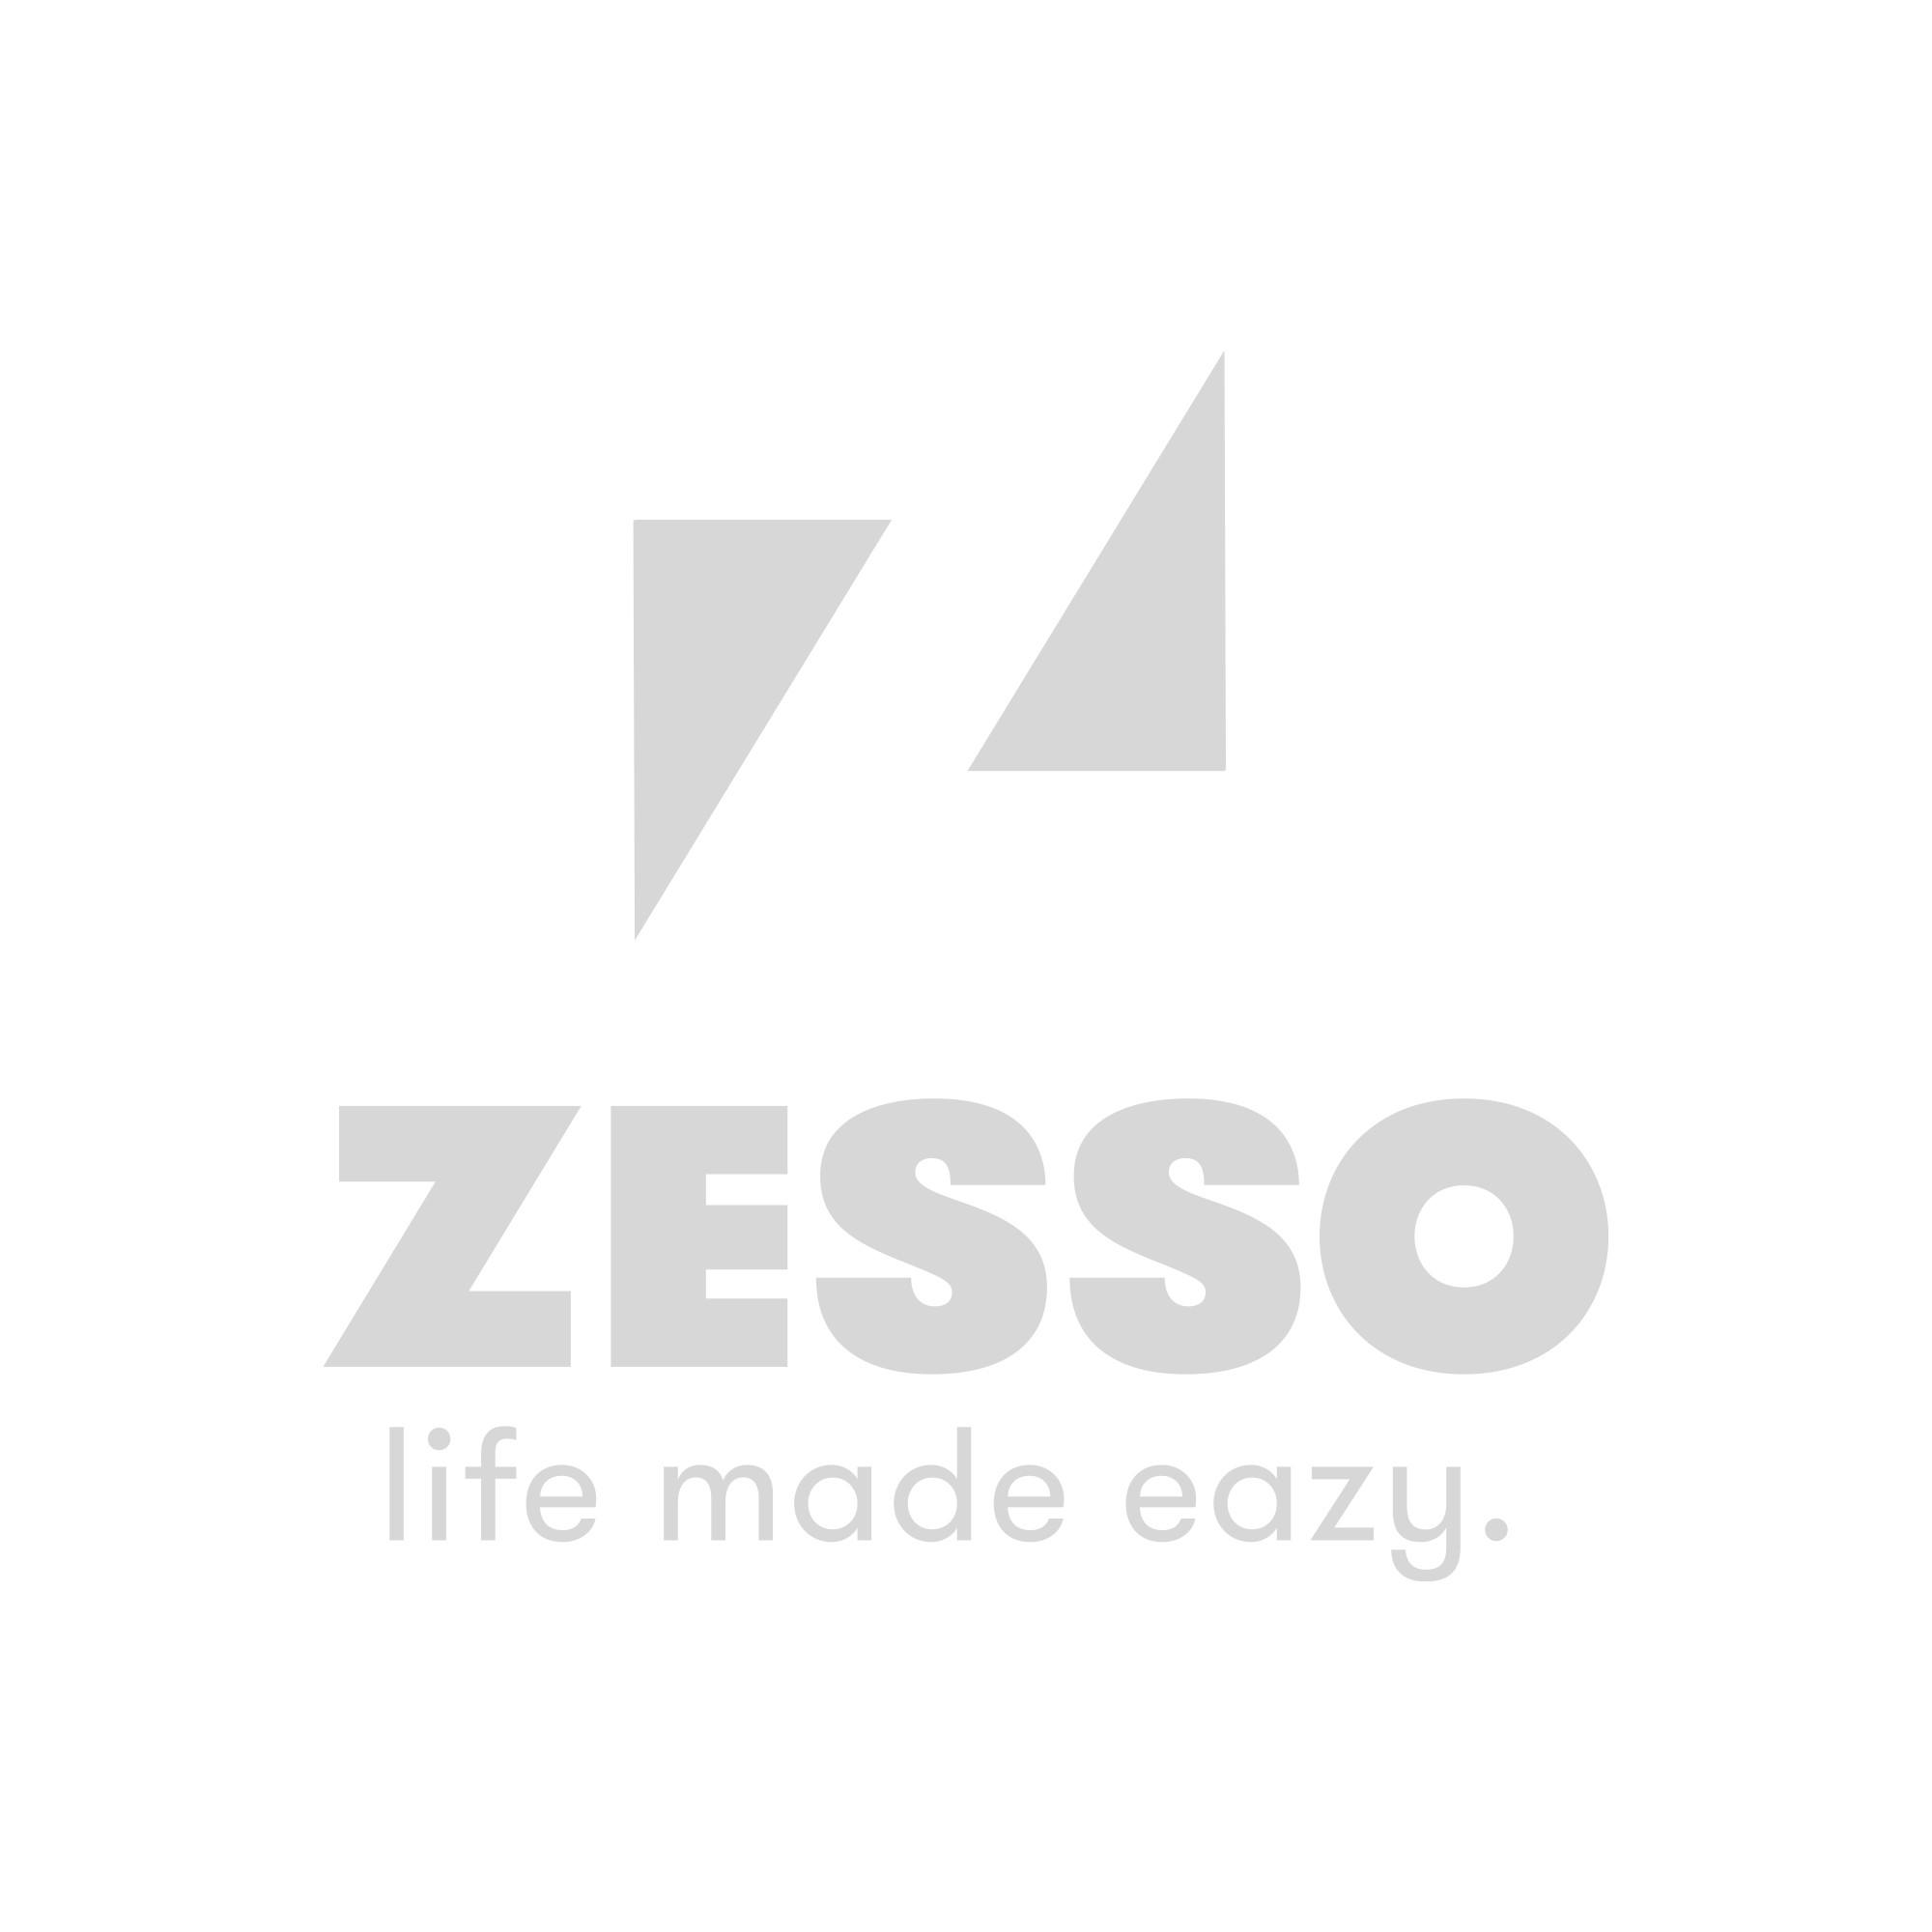 Bobux Babyslofjes Soft Soles Zebra Grijs – Medium